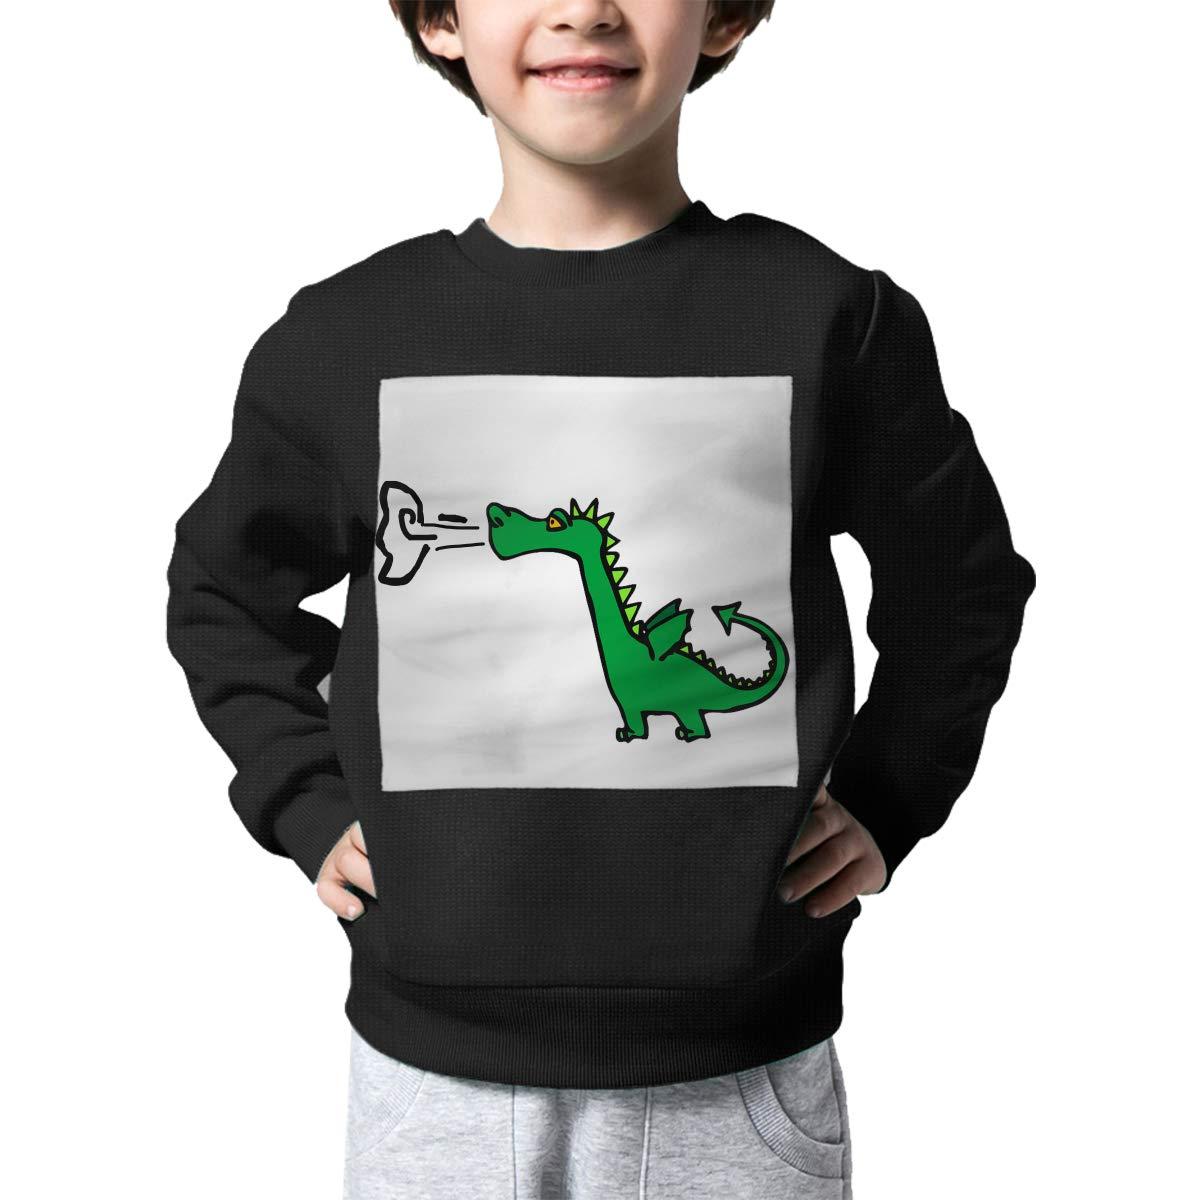 BaPaLa Gastronomy Dinosaur Boys Pullover Sweater Lovely Crew Neck Knitted Sweater for 2-6T